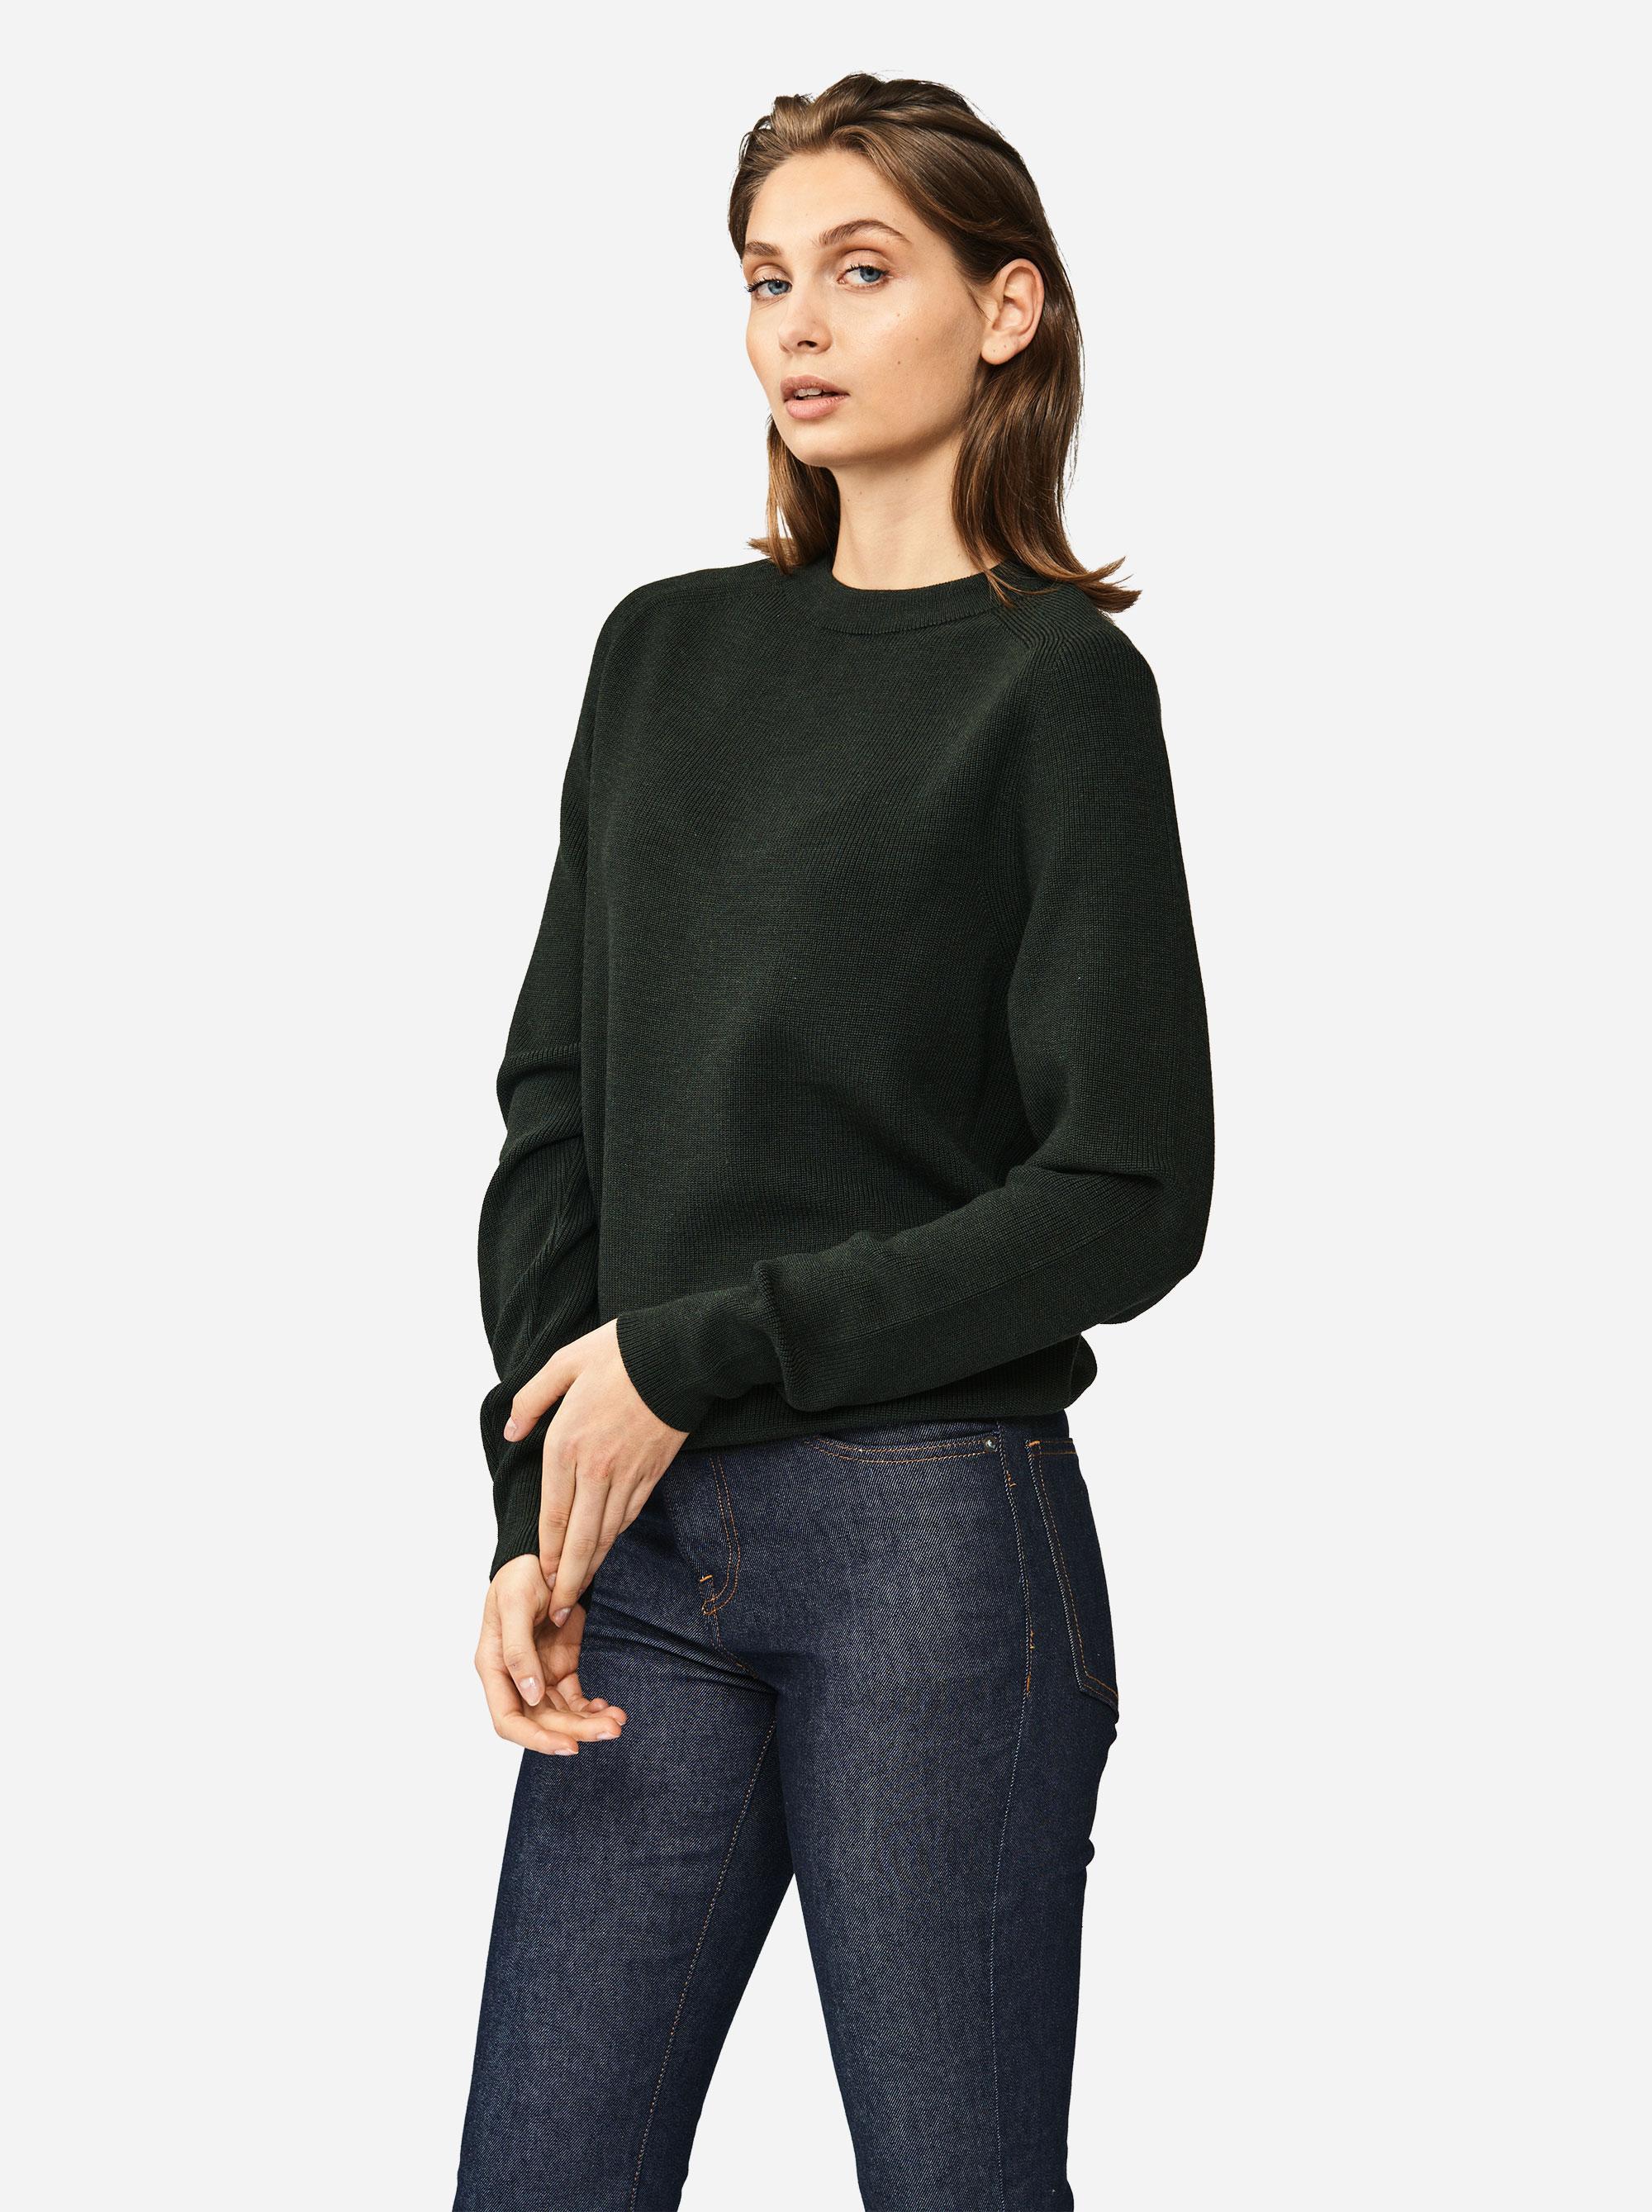 Teym - Crewneck - The Merino Sweater - Women - Green - 1